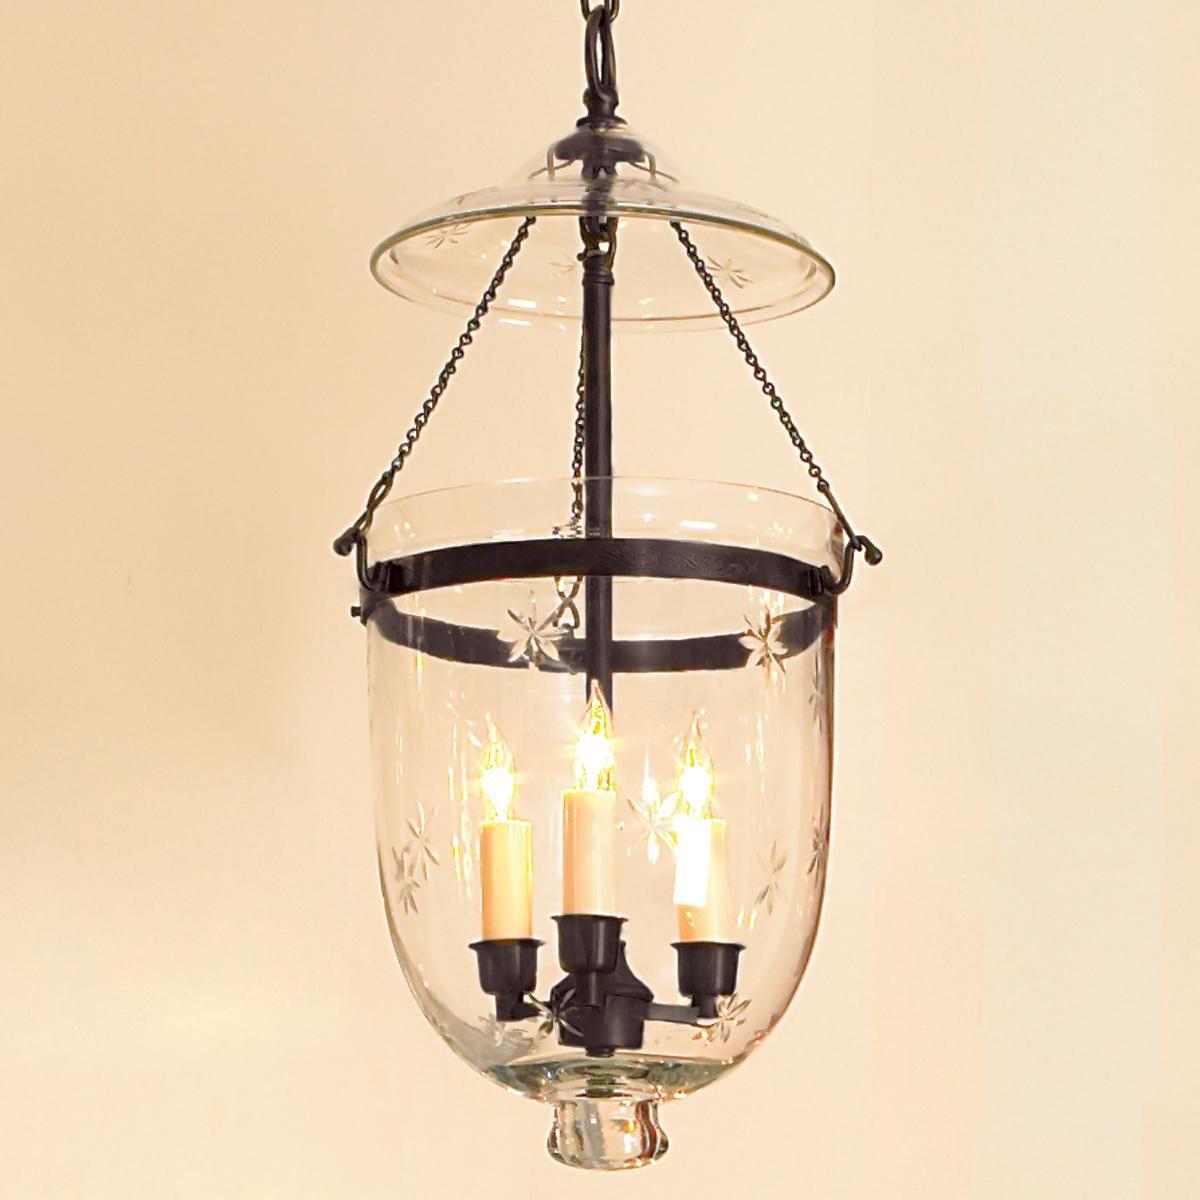 engraved star glass smokebell lantern kitchen lighting ceiling rh pinterest com